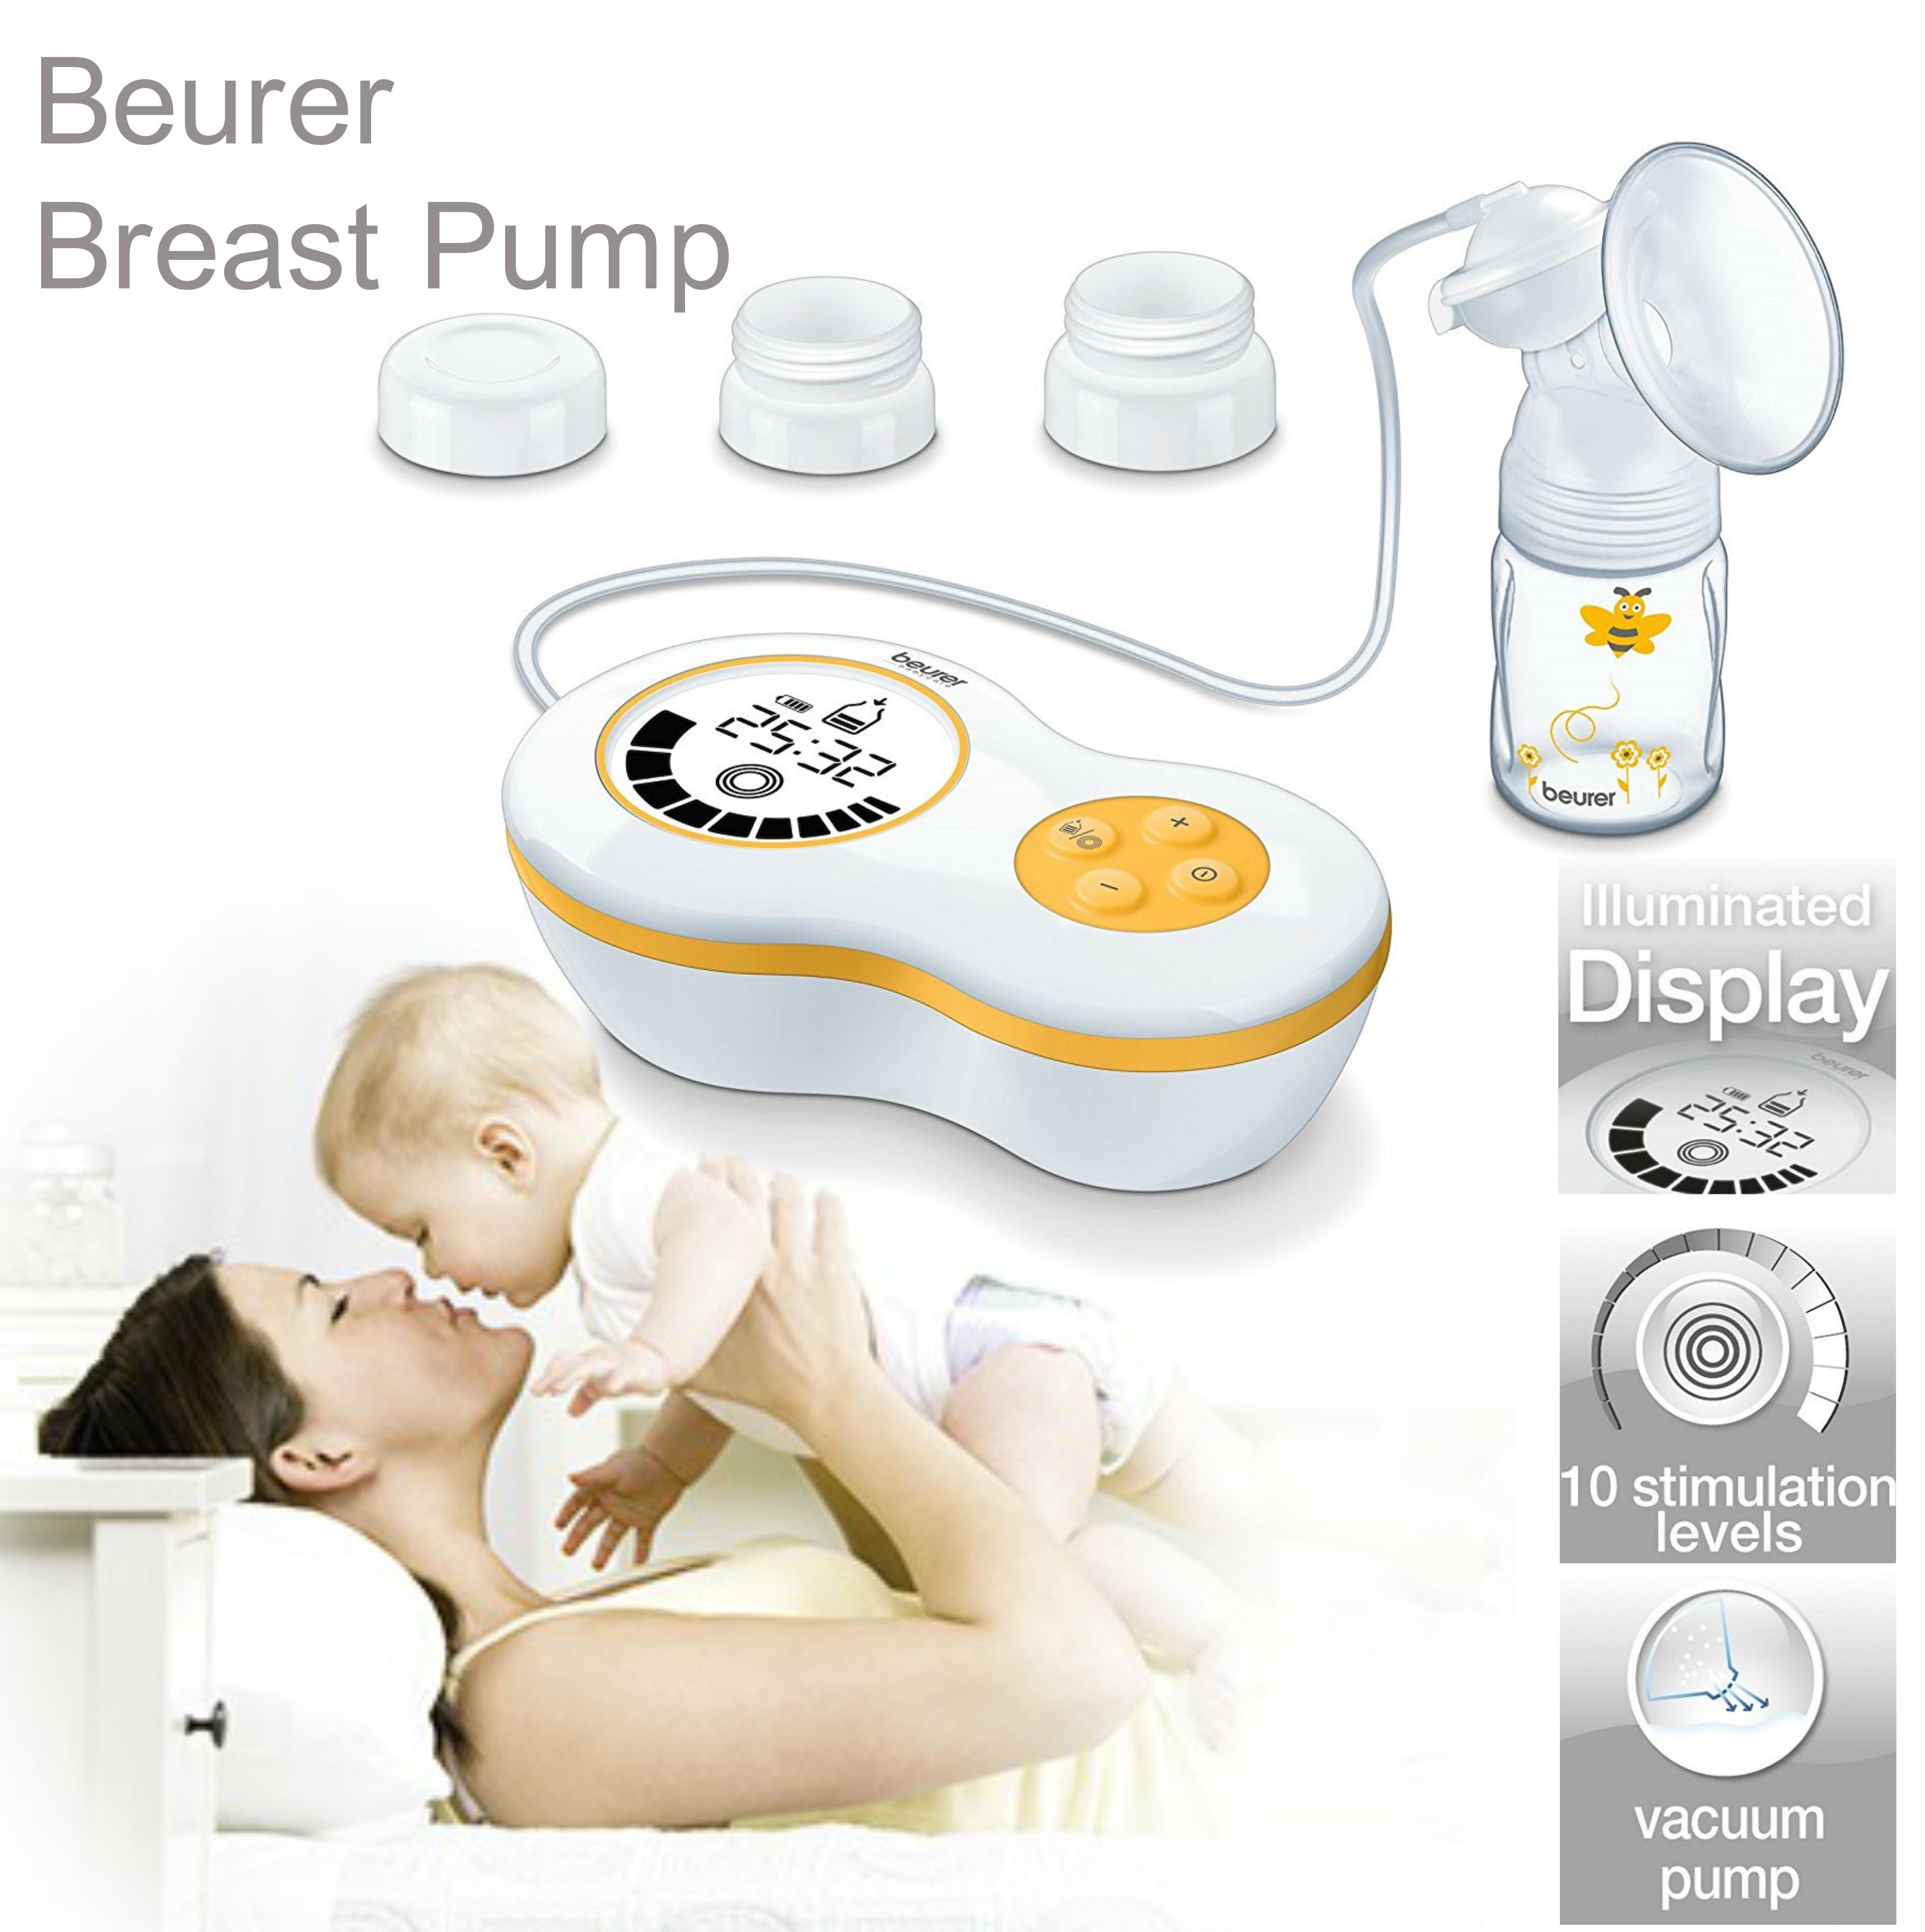 Beurer BY40 Breast Pump|Baby Feeding|Milk-Water|Bottles|Screw Cap|Adapter|New|